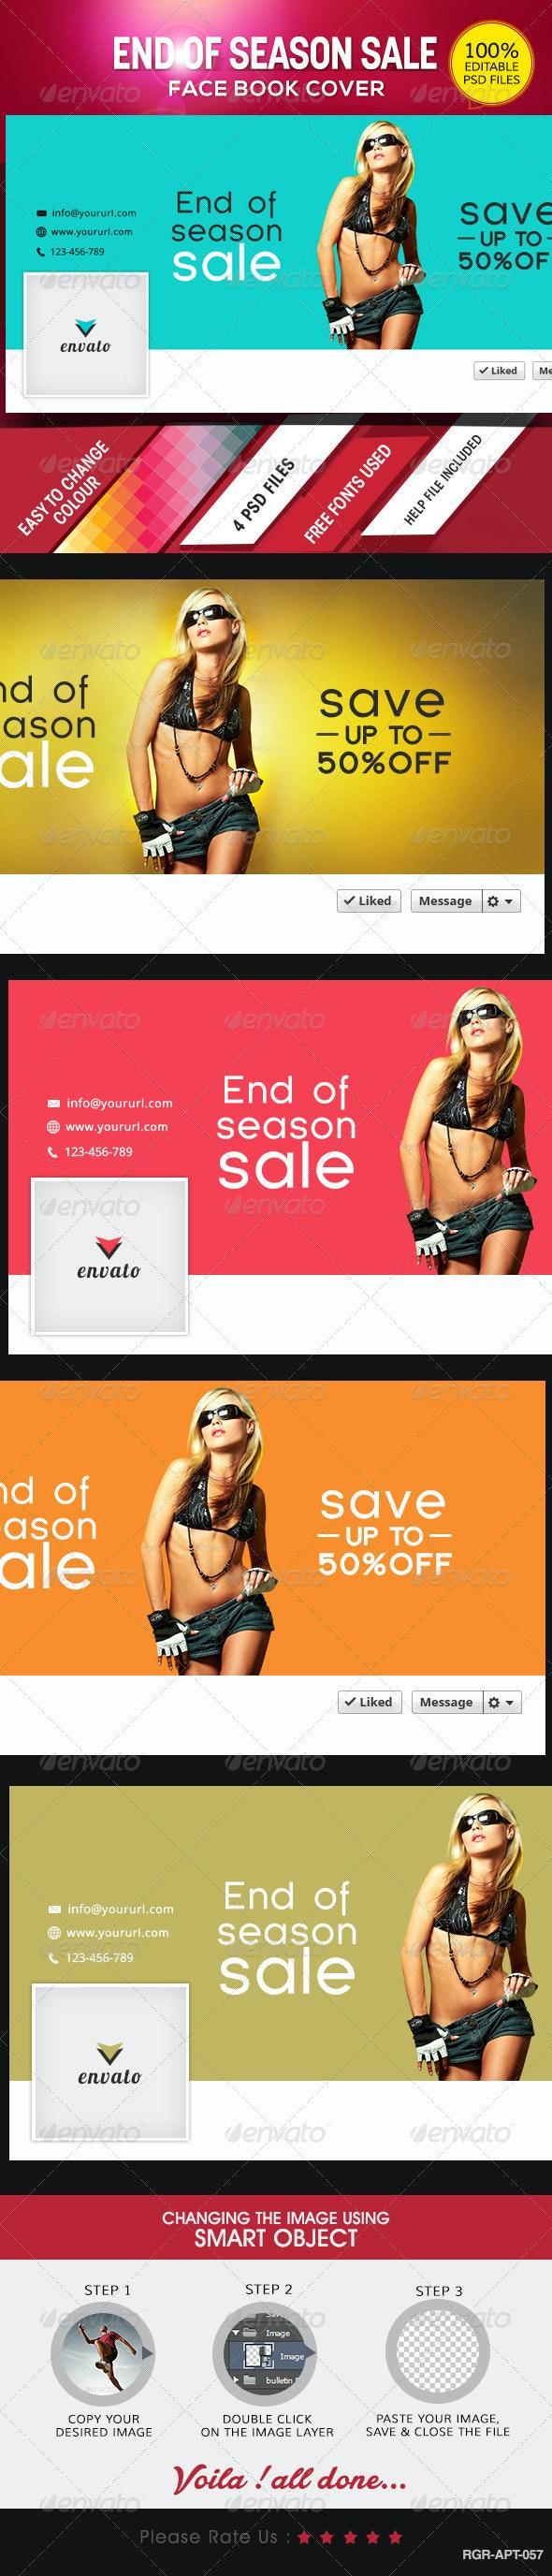 End of Season Sale Facebook Covers